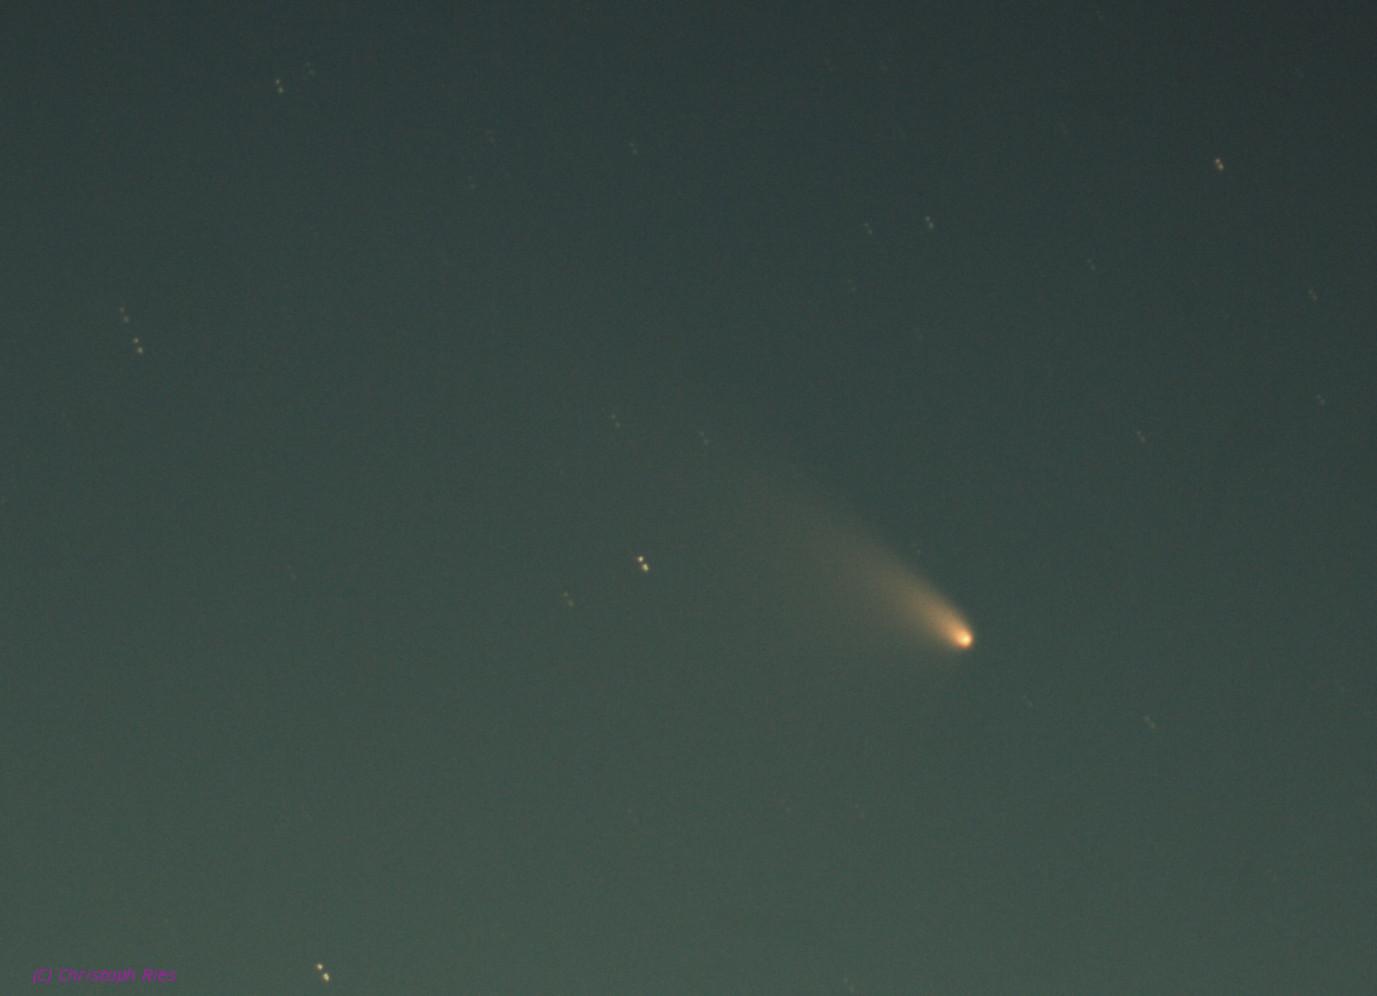 Kometen Bilder